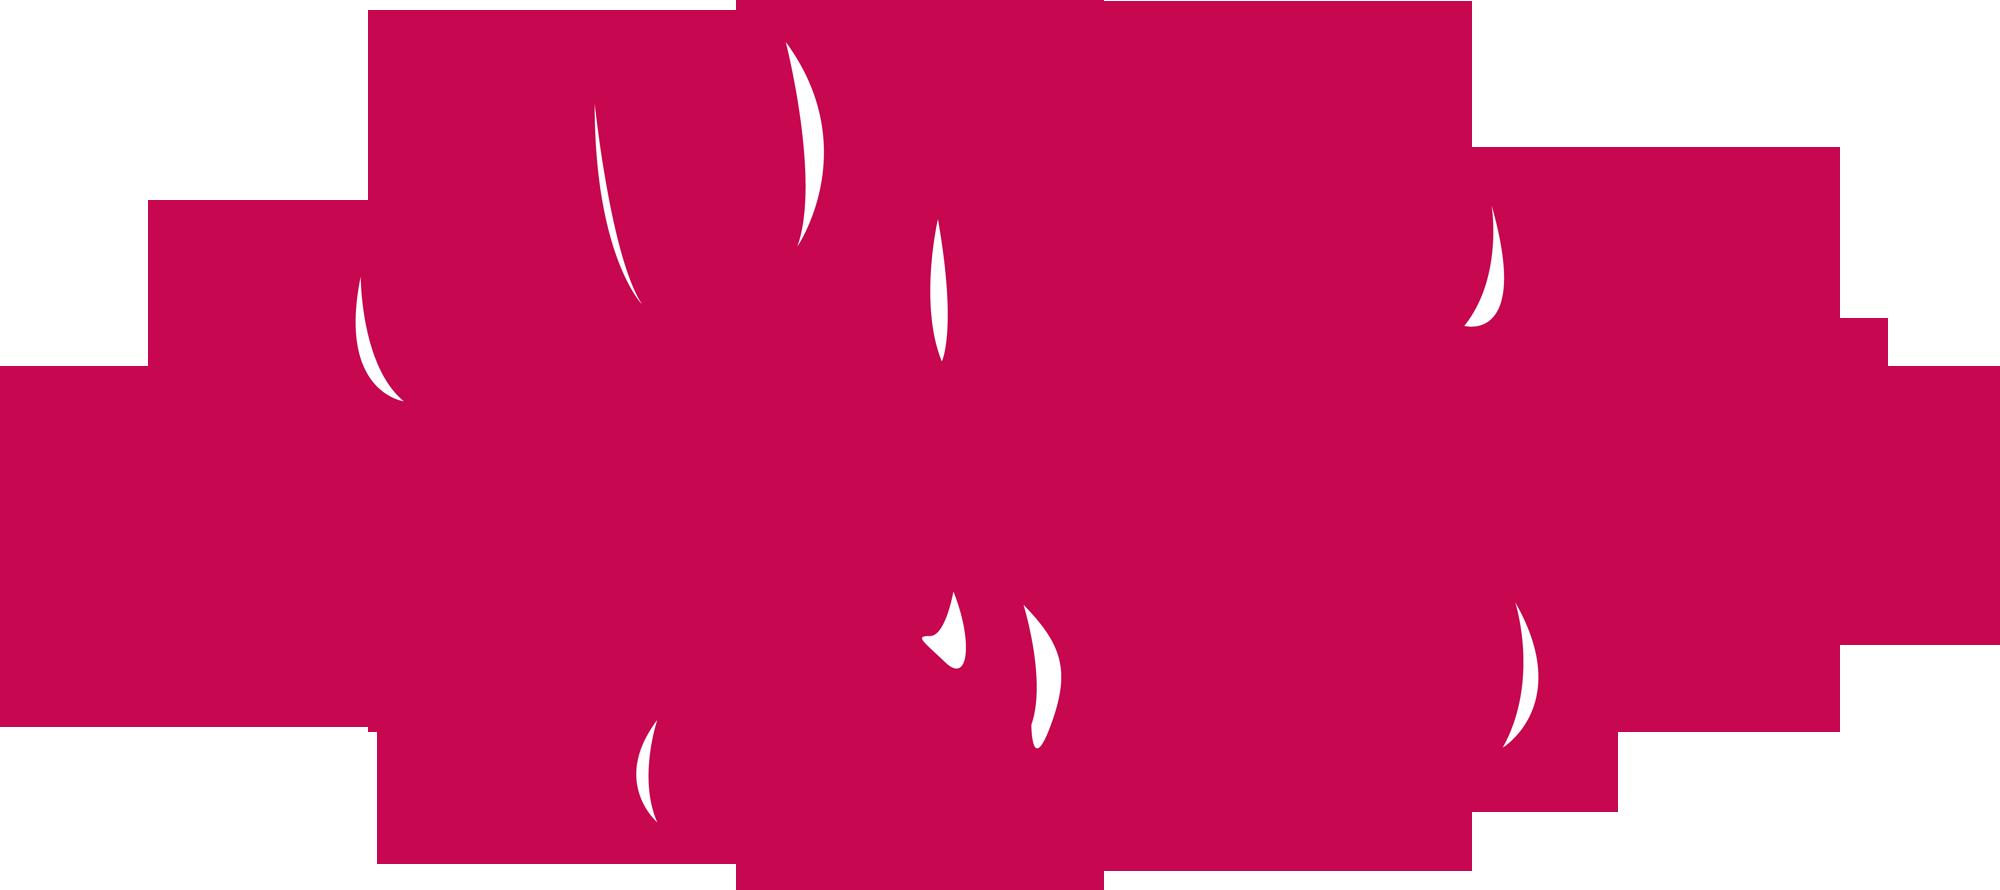 Big Clits Big Lips 19  Redtube Free Porn Videos amp Sex Movies